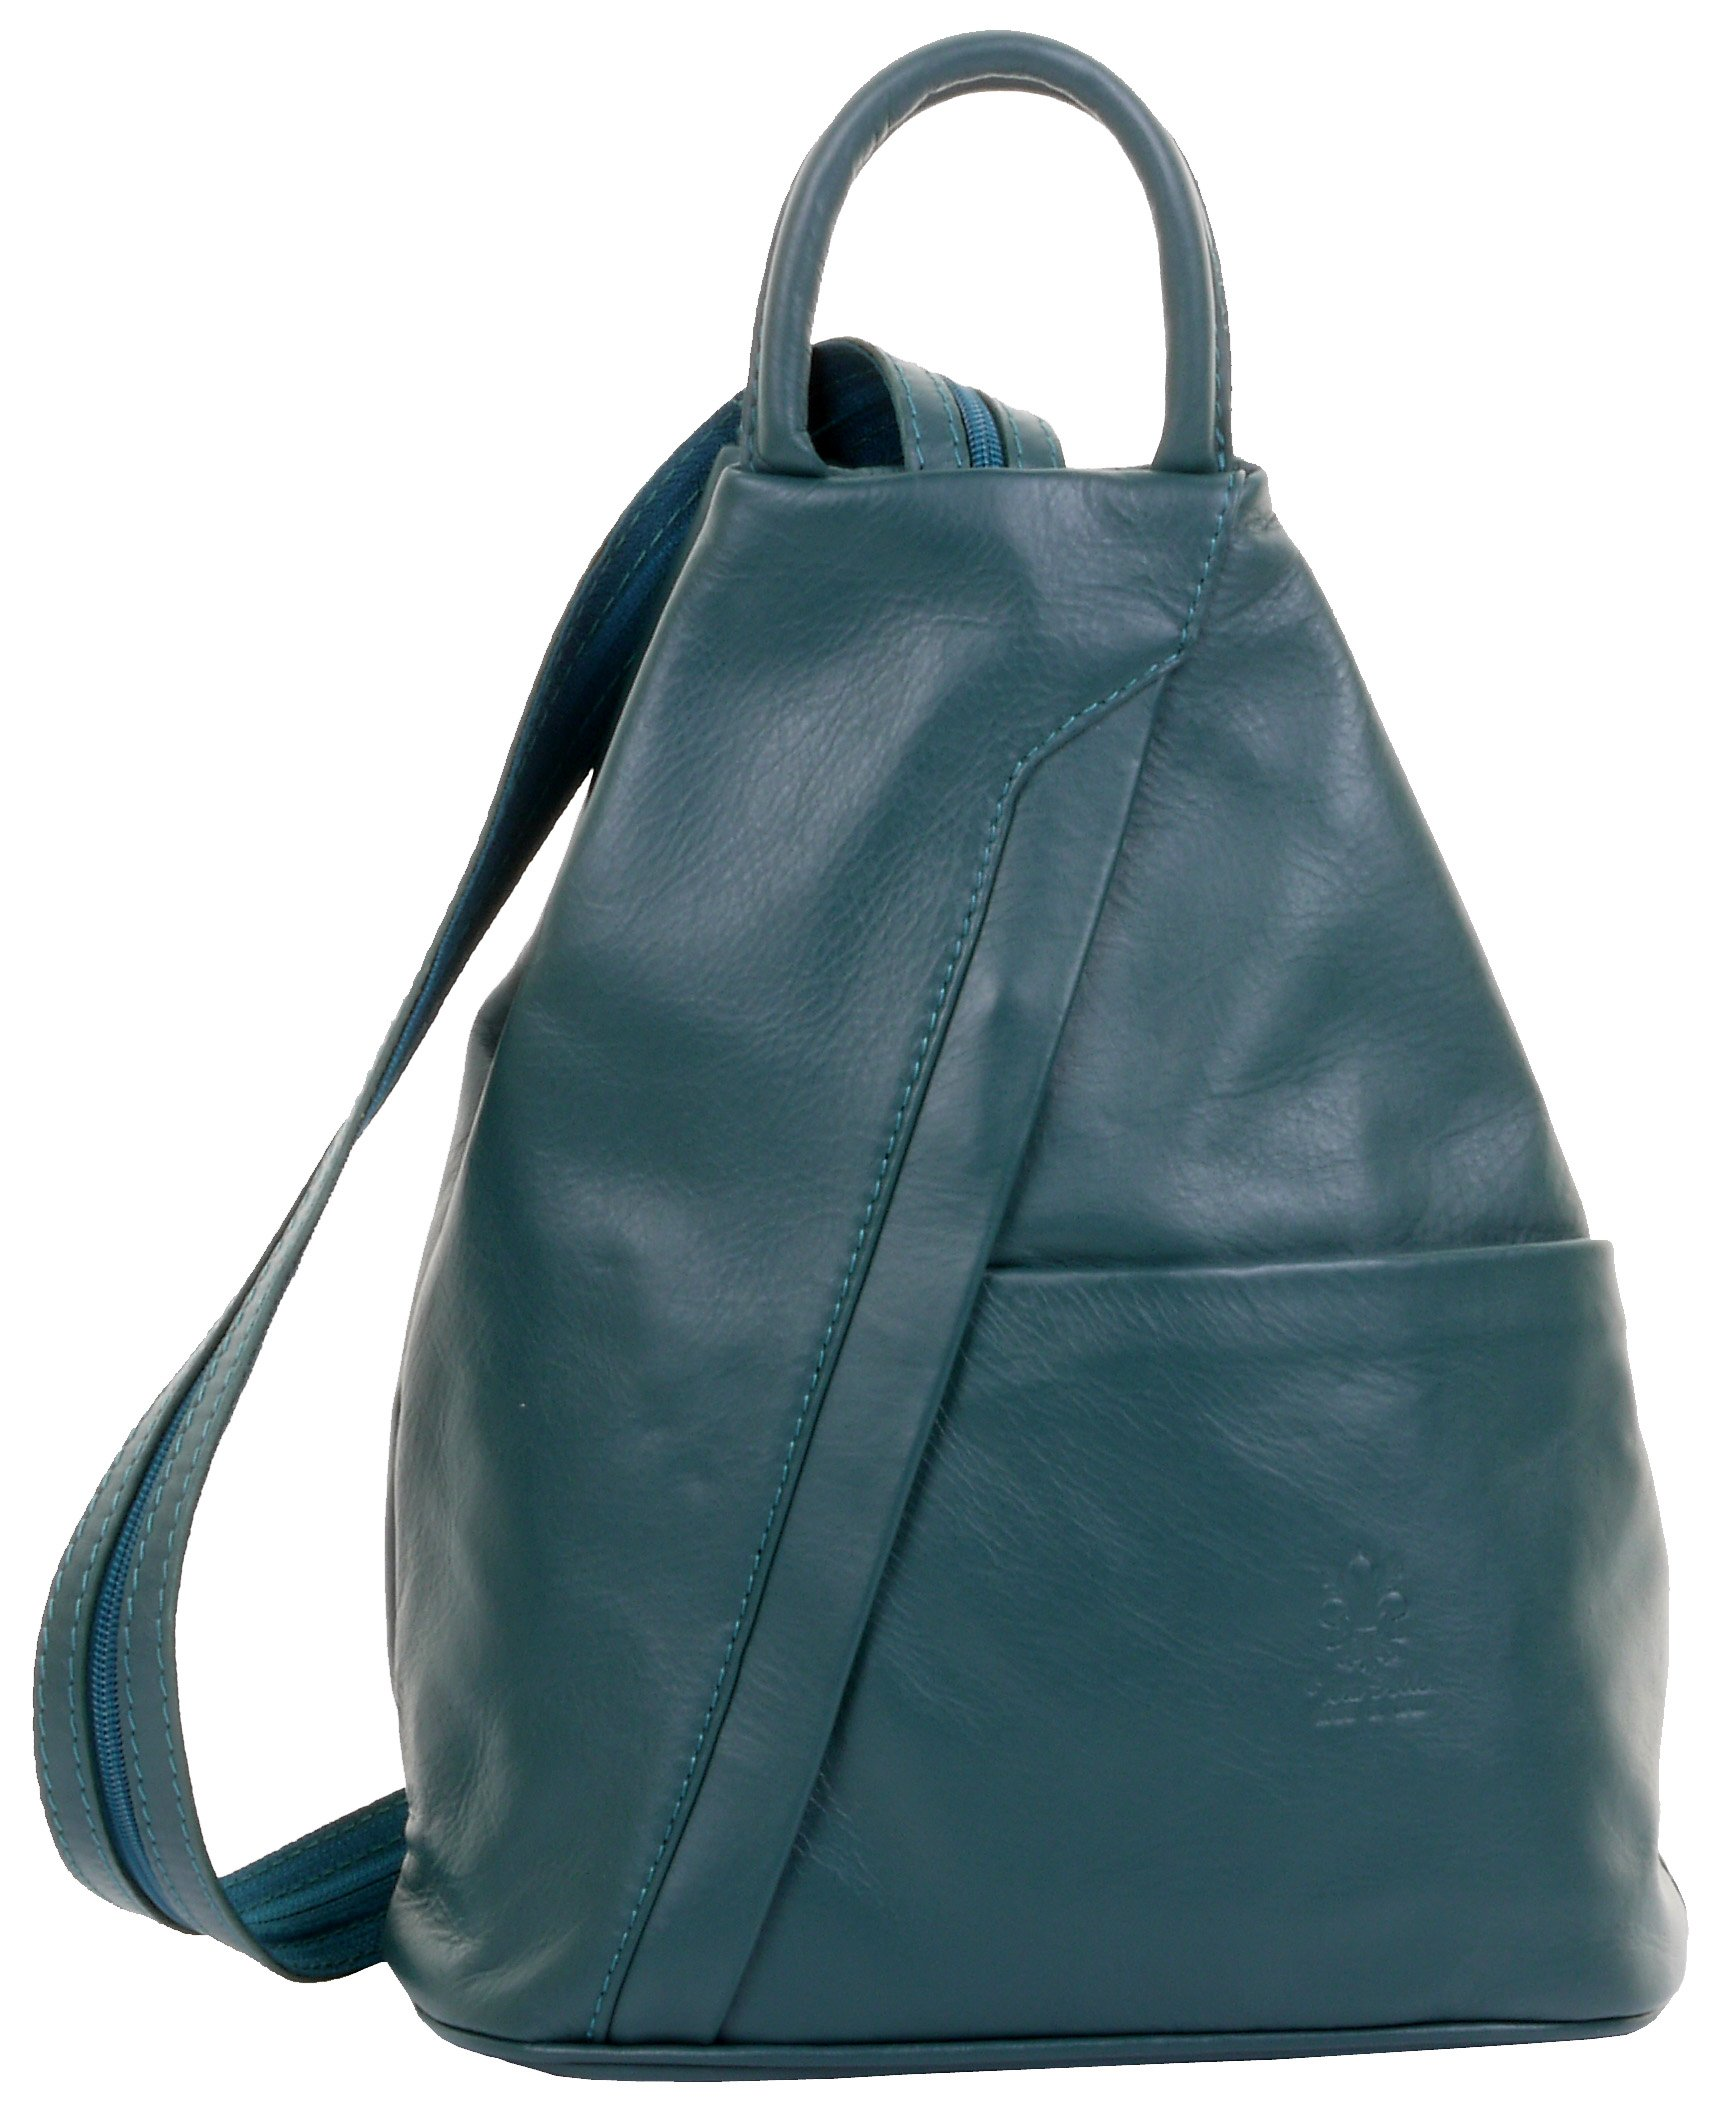 Primo Sacchi Italian Soft Napa Leather Dark Teal Top Handle Shoulder Bag Rucksack Backpack